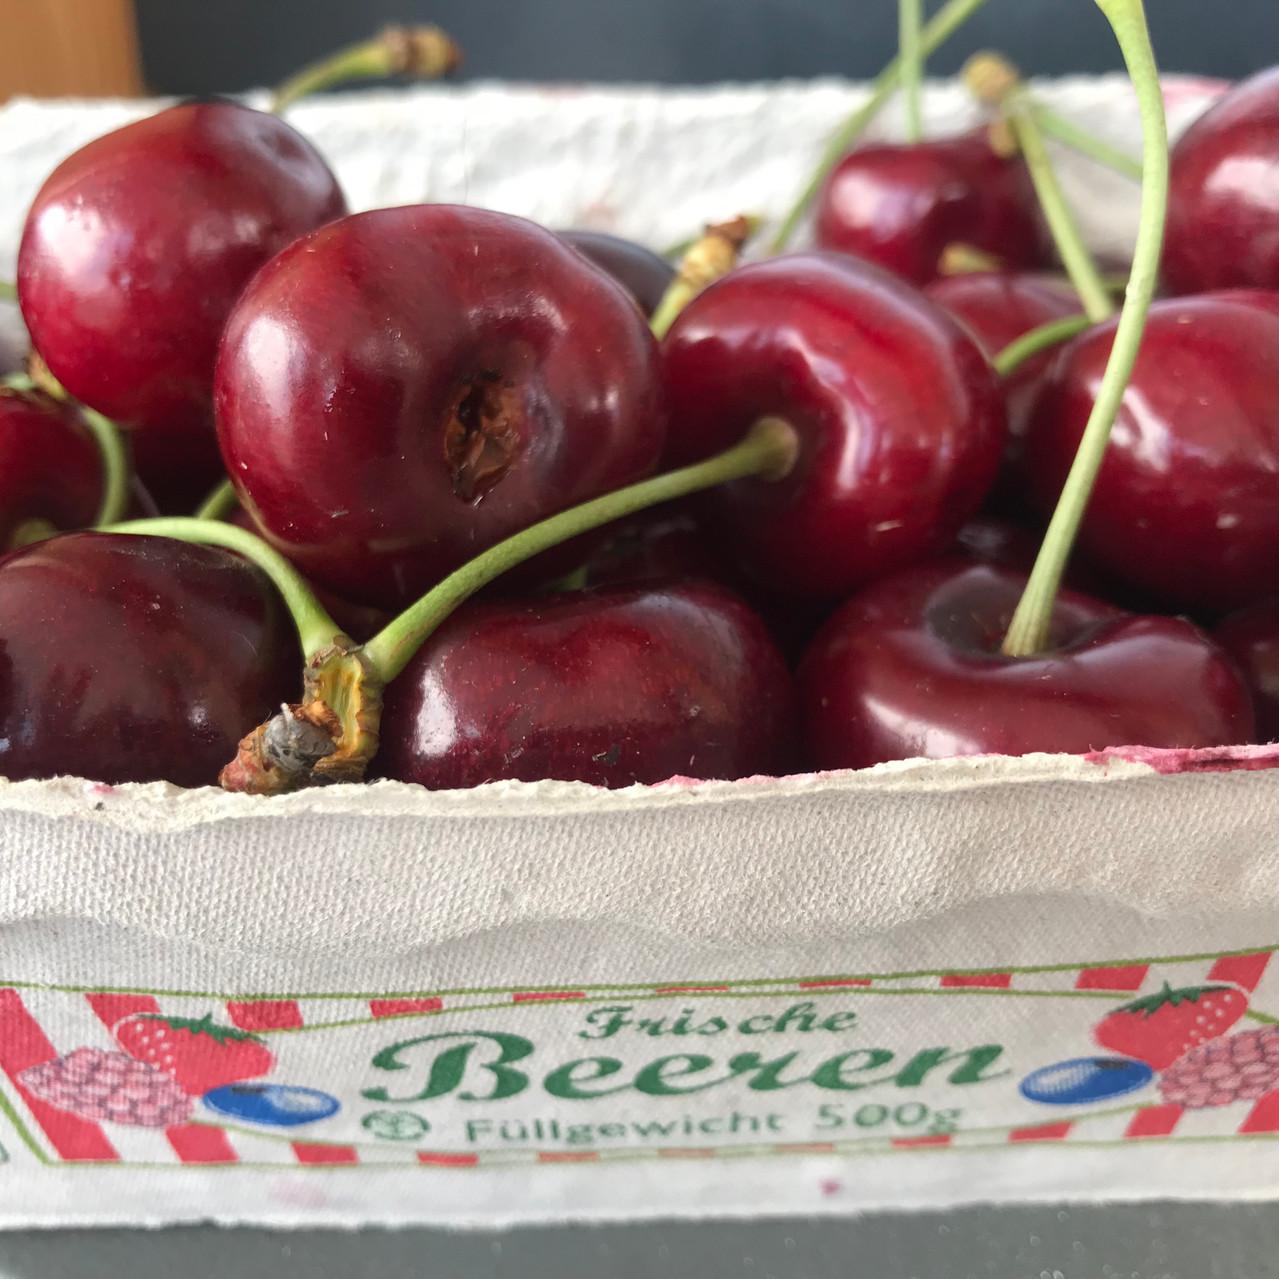 Cherries at local market